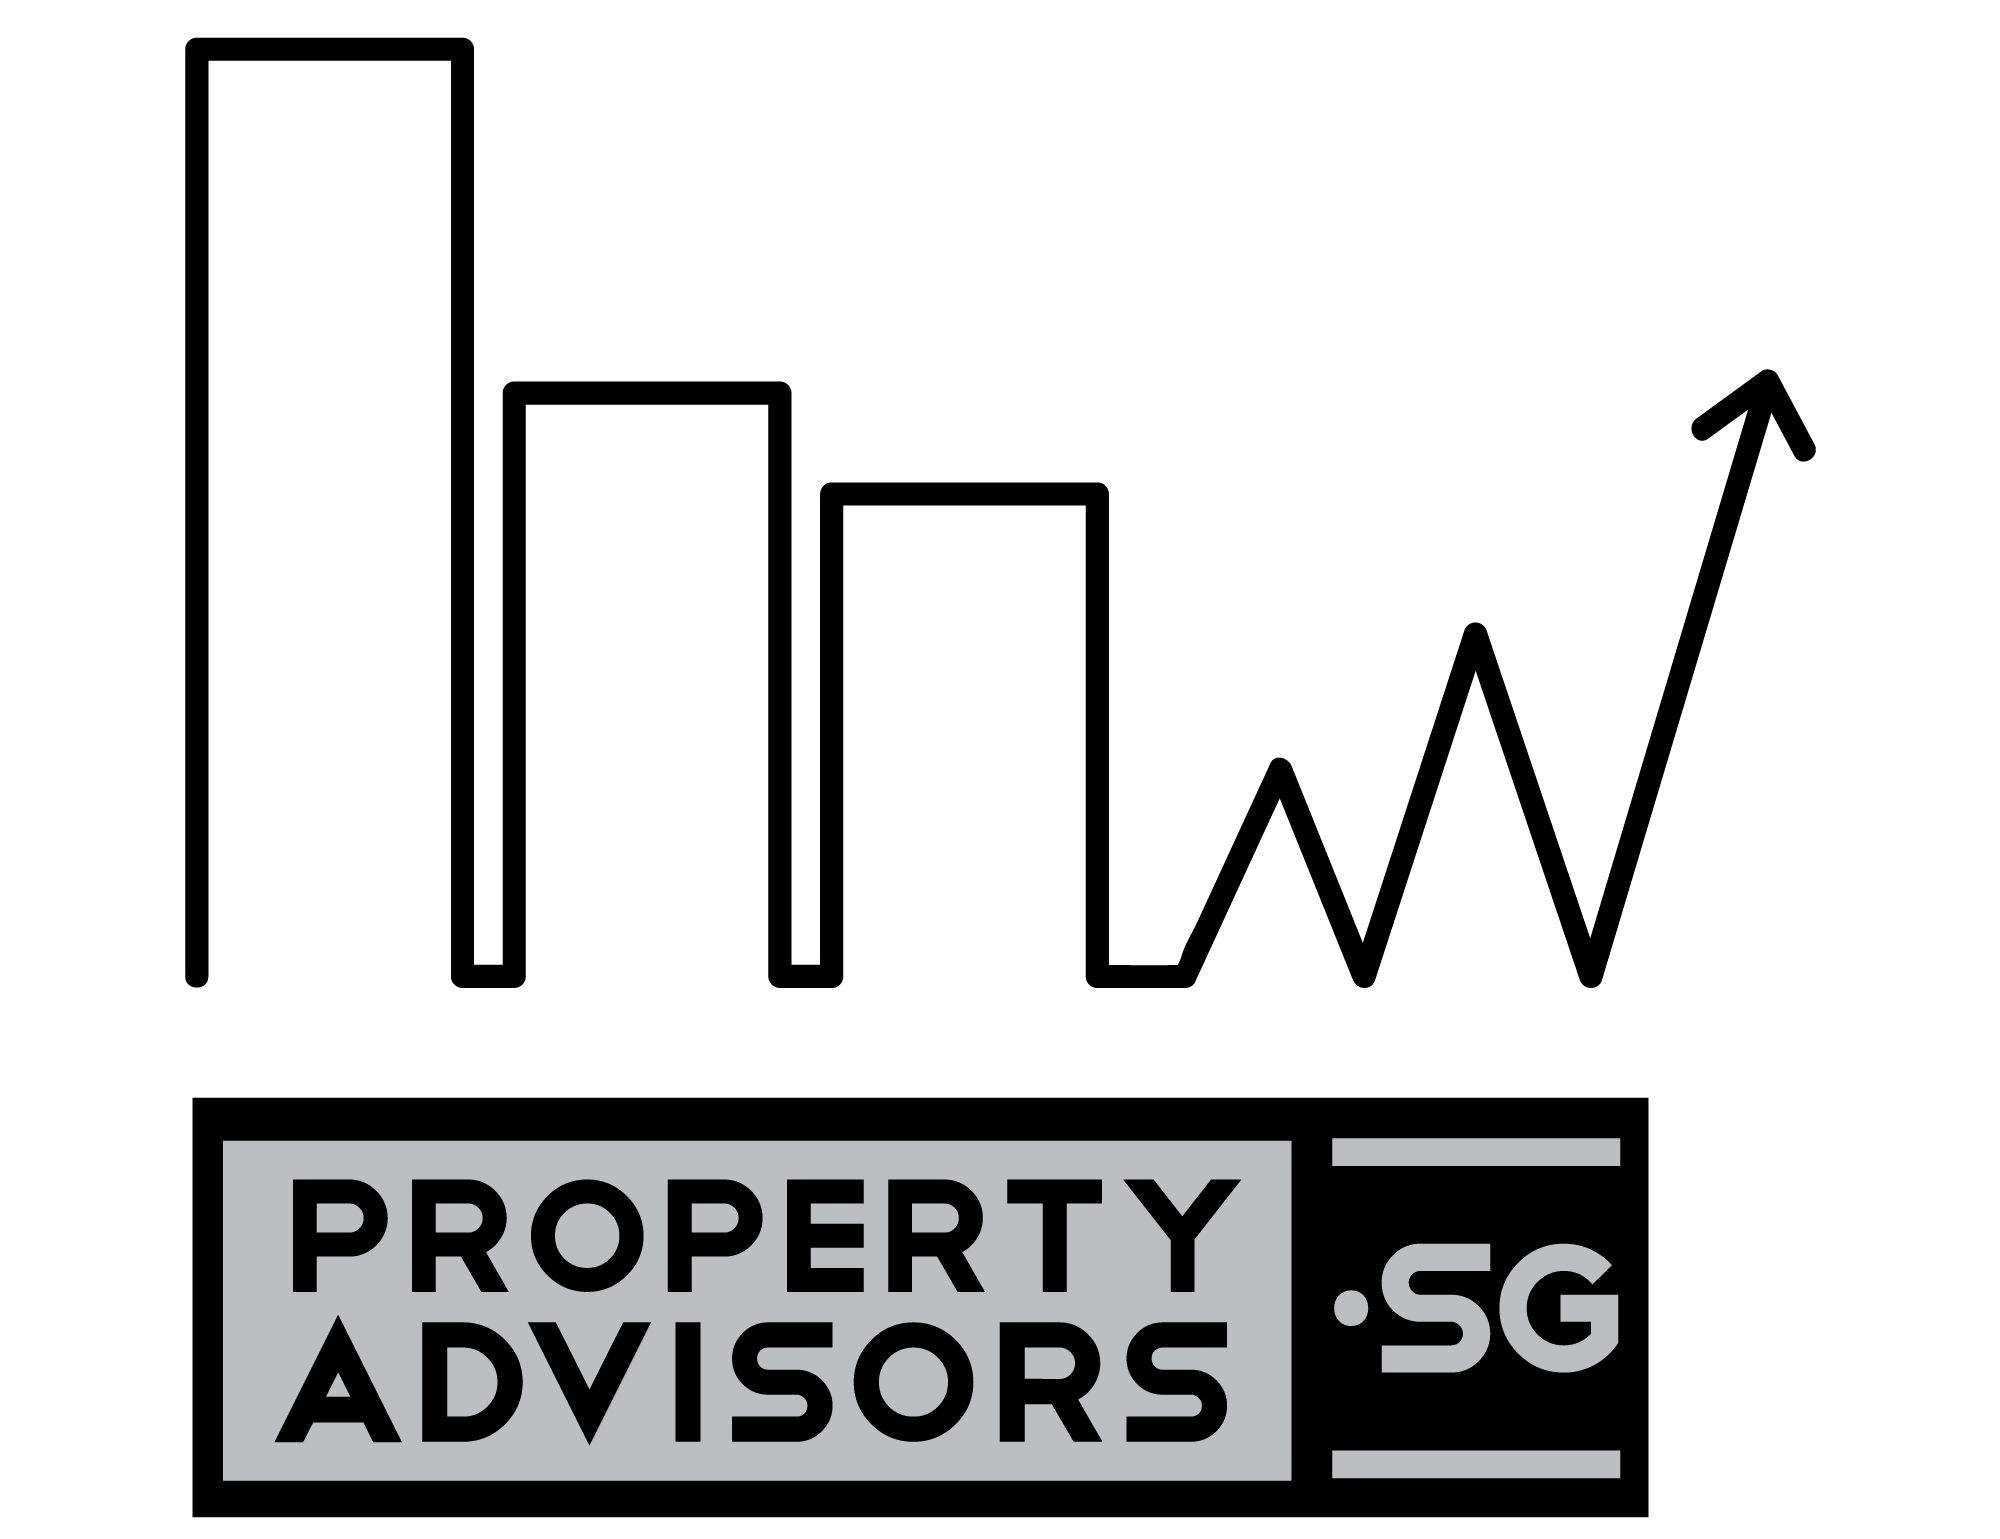 PropertyAdvisors.SG